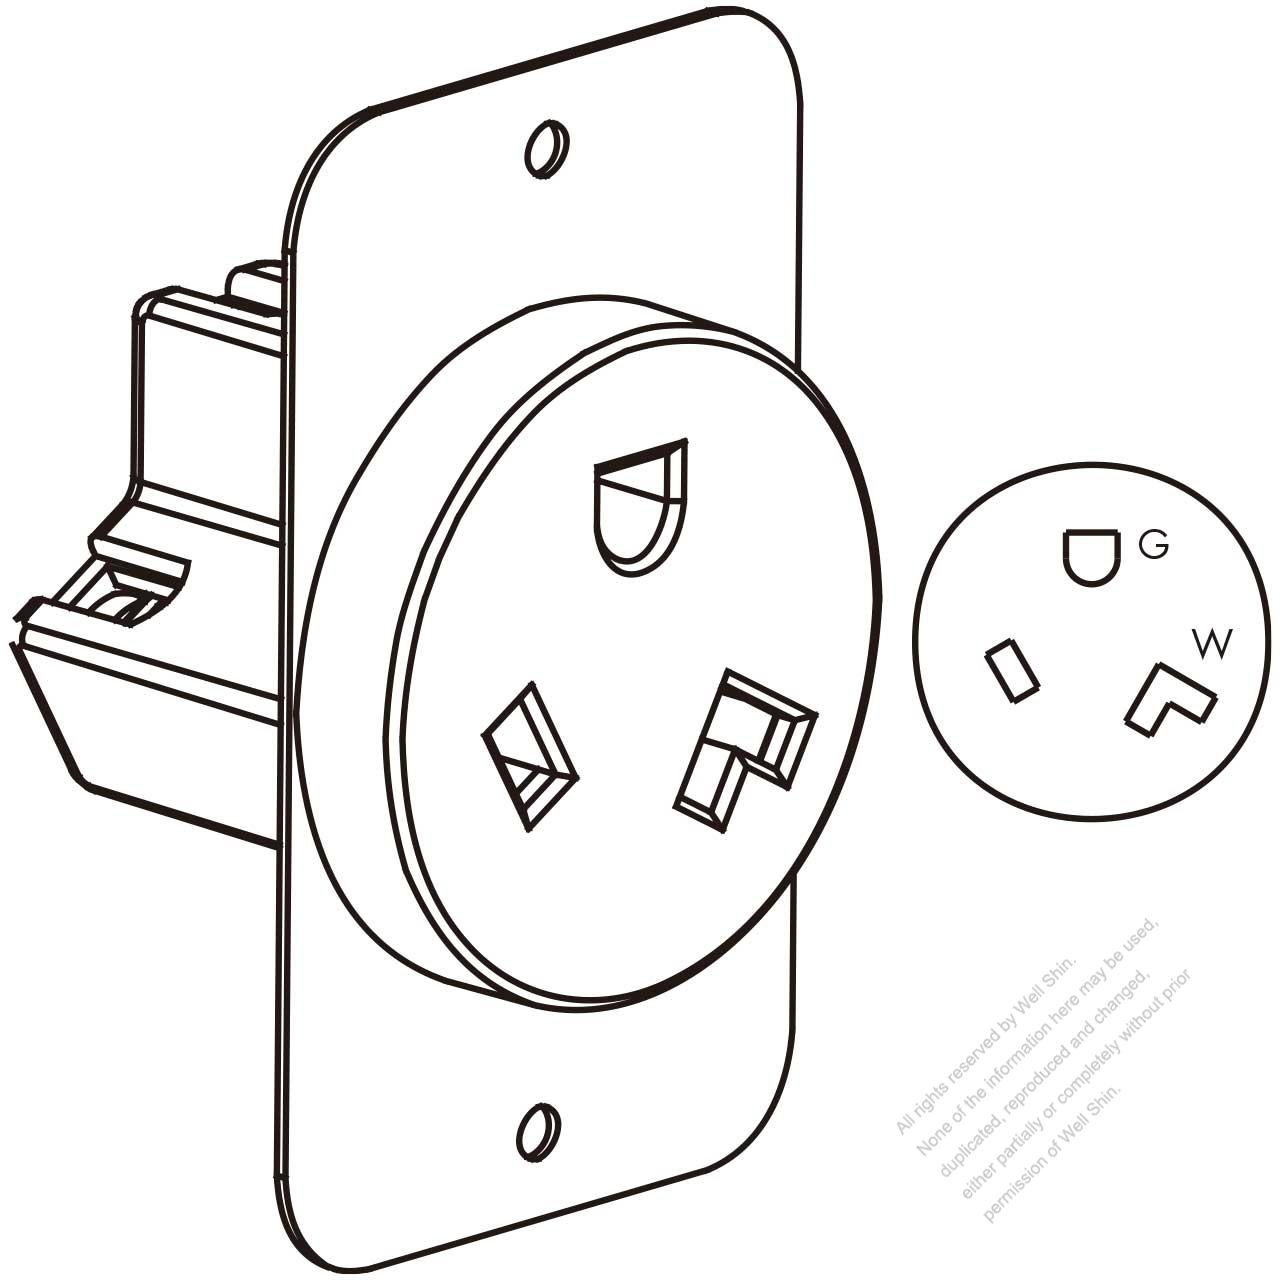 usa canada flush mount receptacle nema 7 30r 2 p 3 wire grounding 220 Plug Configurations usa canada flush mount receptacle nema 7 30r 2 p 3 wire grounding